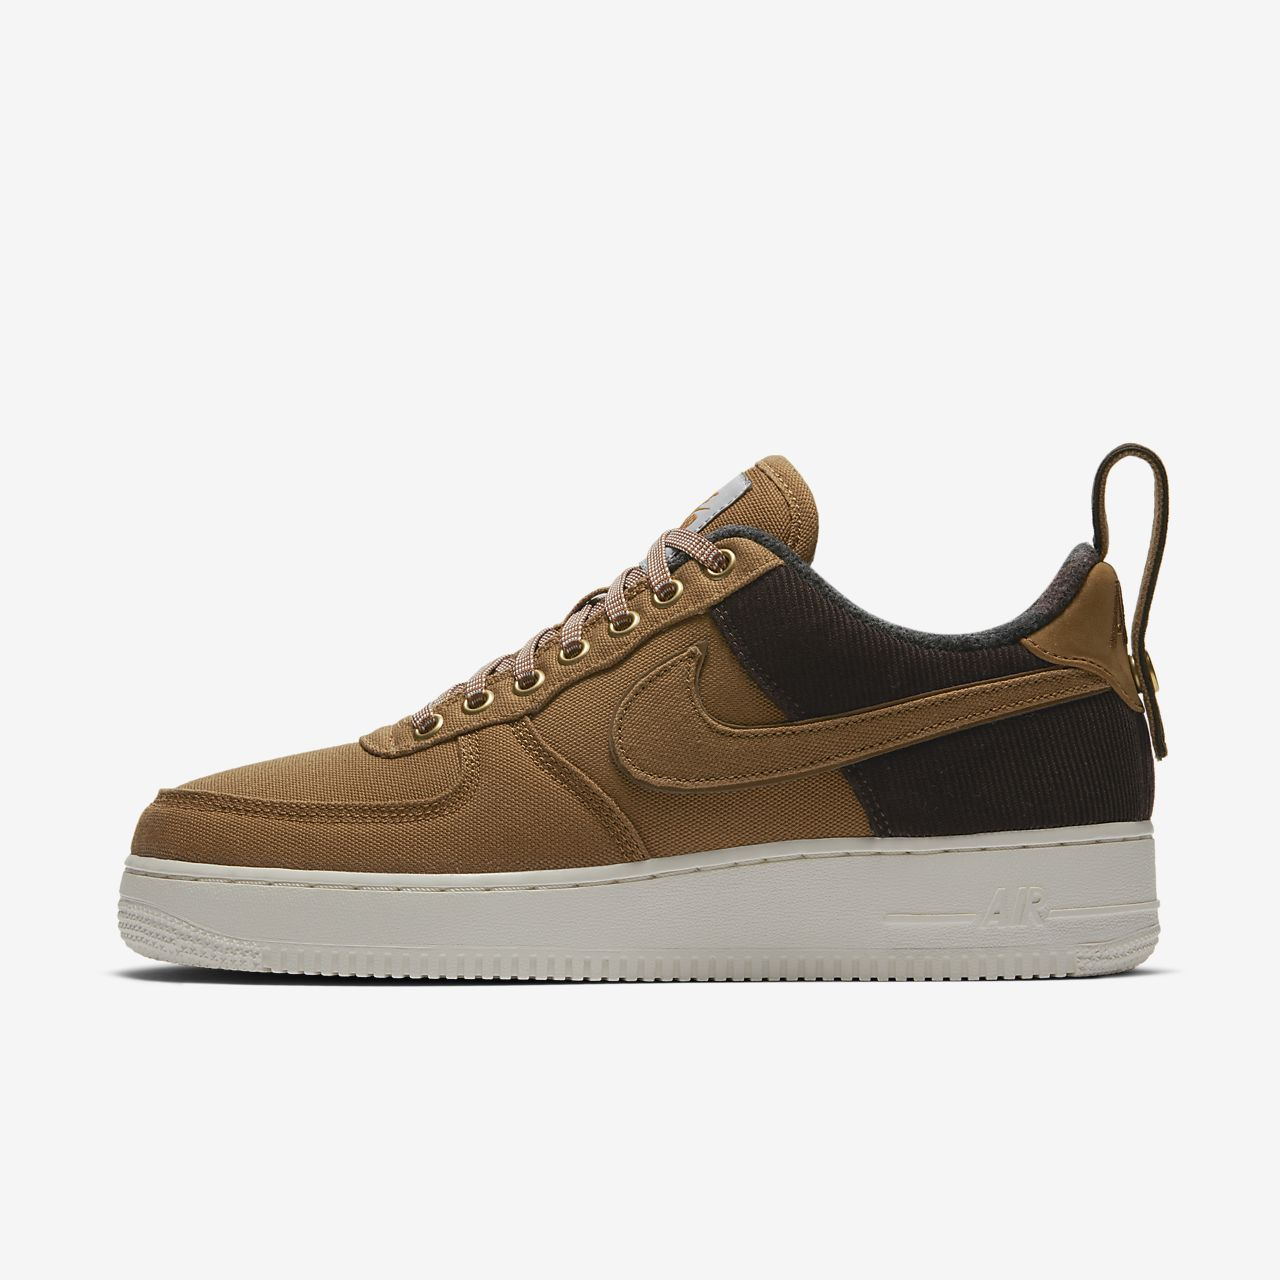 a9df95e00a4 Nike x Carhartt WIP Air Force 1 Men s Shoe. Nike.com MY